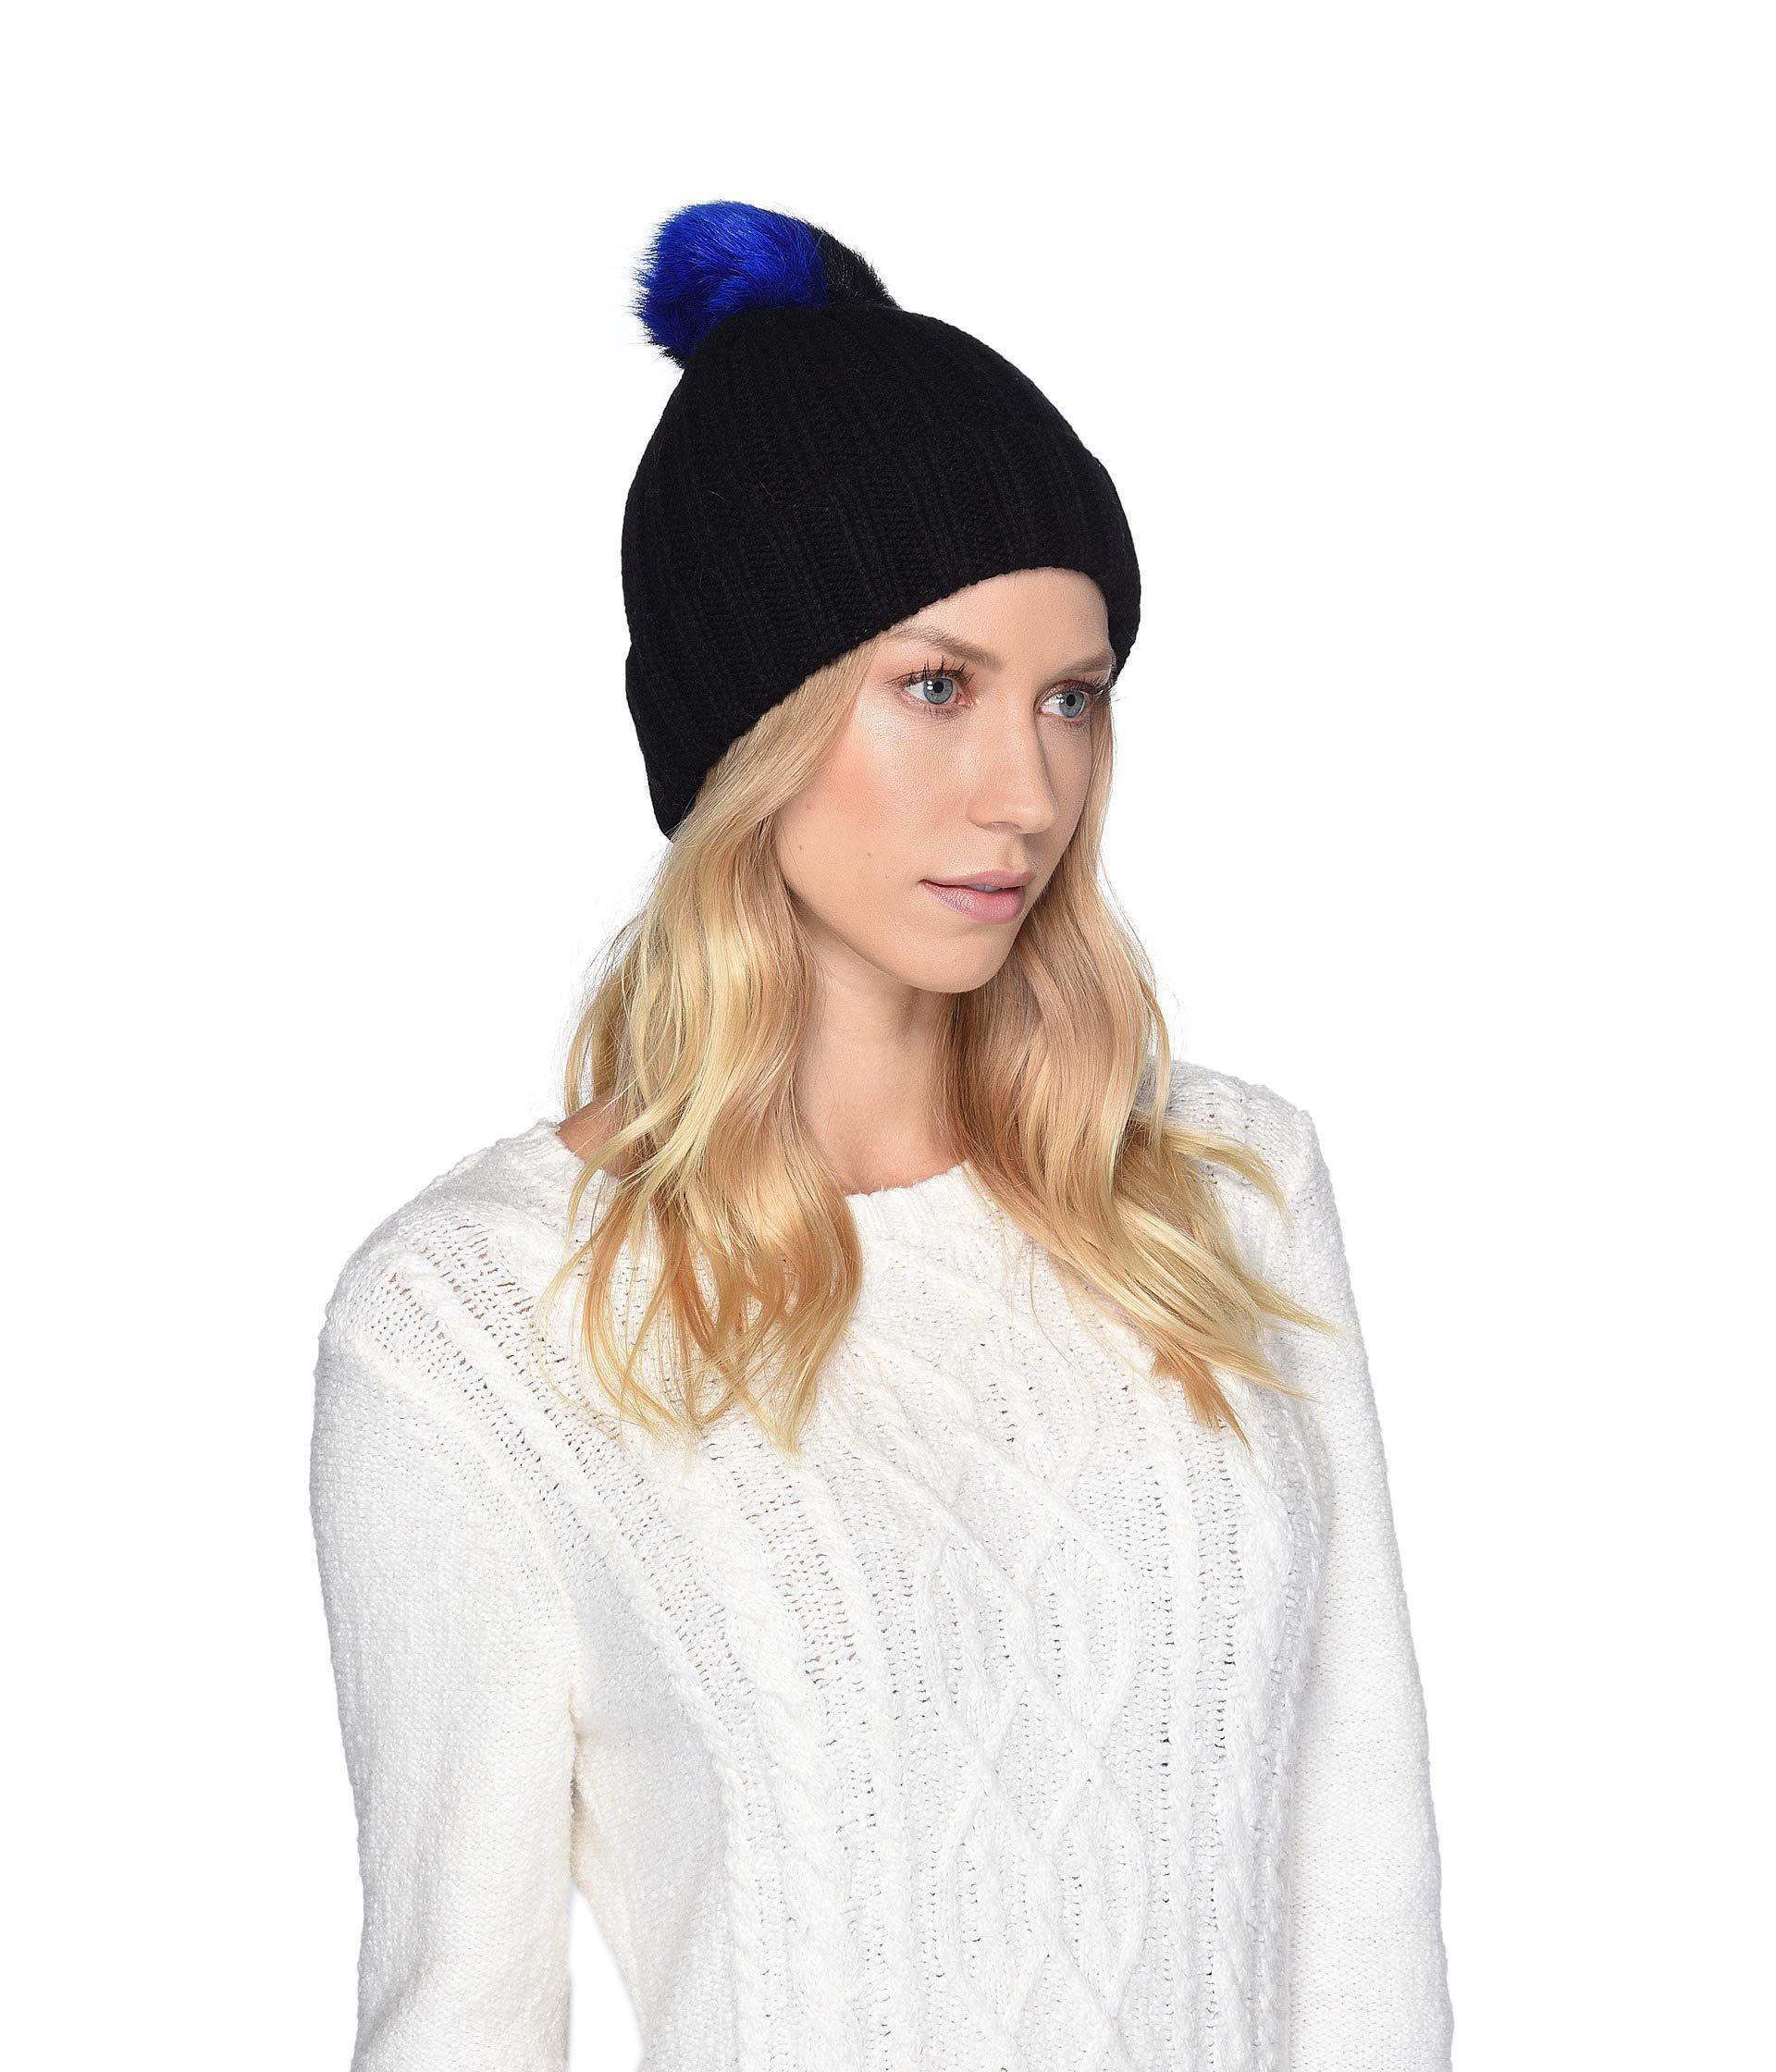 Lyst - UGG Multicolored Sheepskin Pom Knit Hat (black Multi) Caps in ... a49f5ca729dc